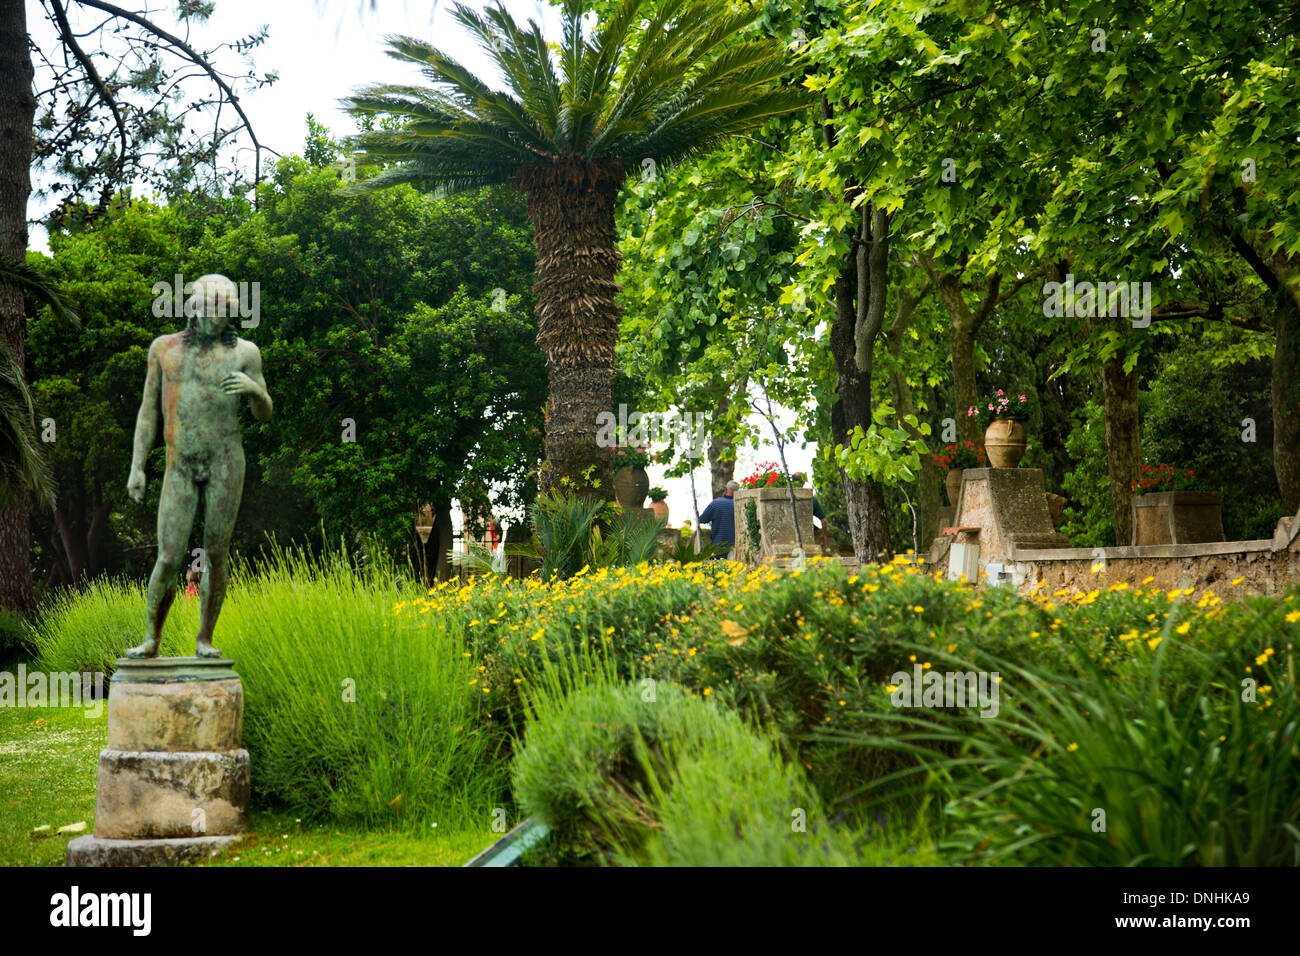 Statue in a garden, Villa Cimbrone, Ravello, Province of Salerno, Campania, Italy Stock Photo